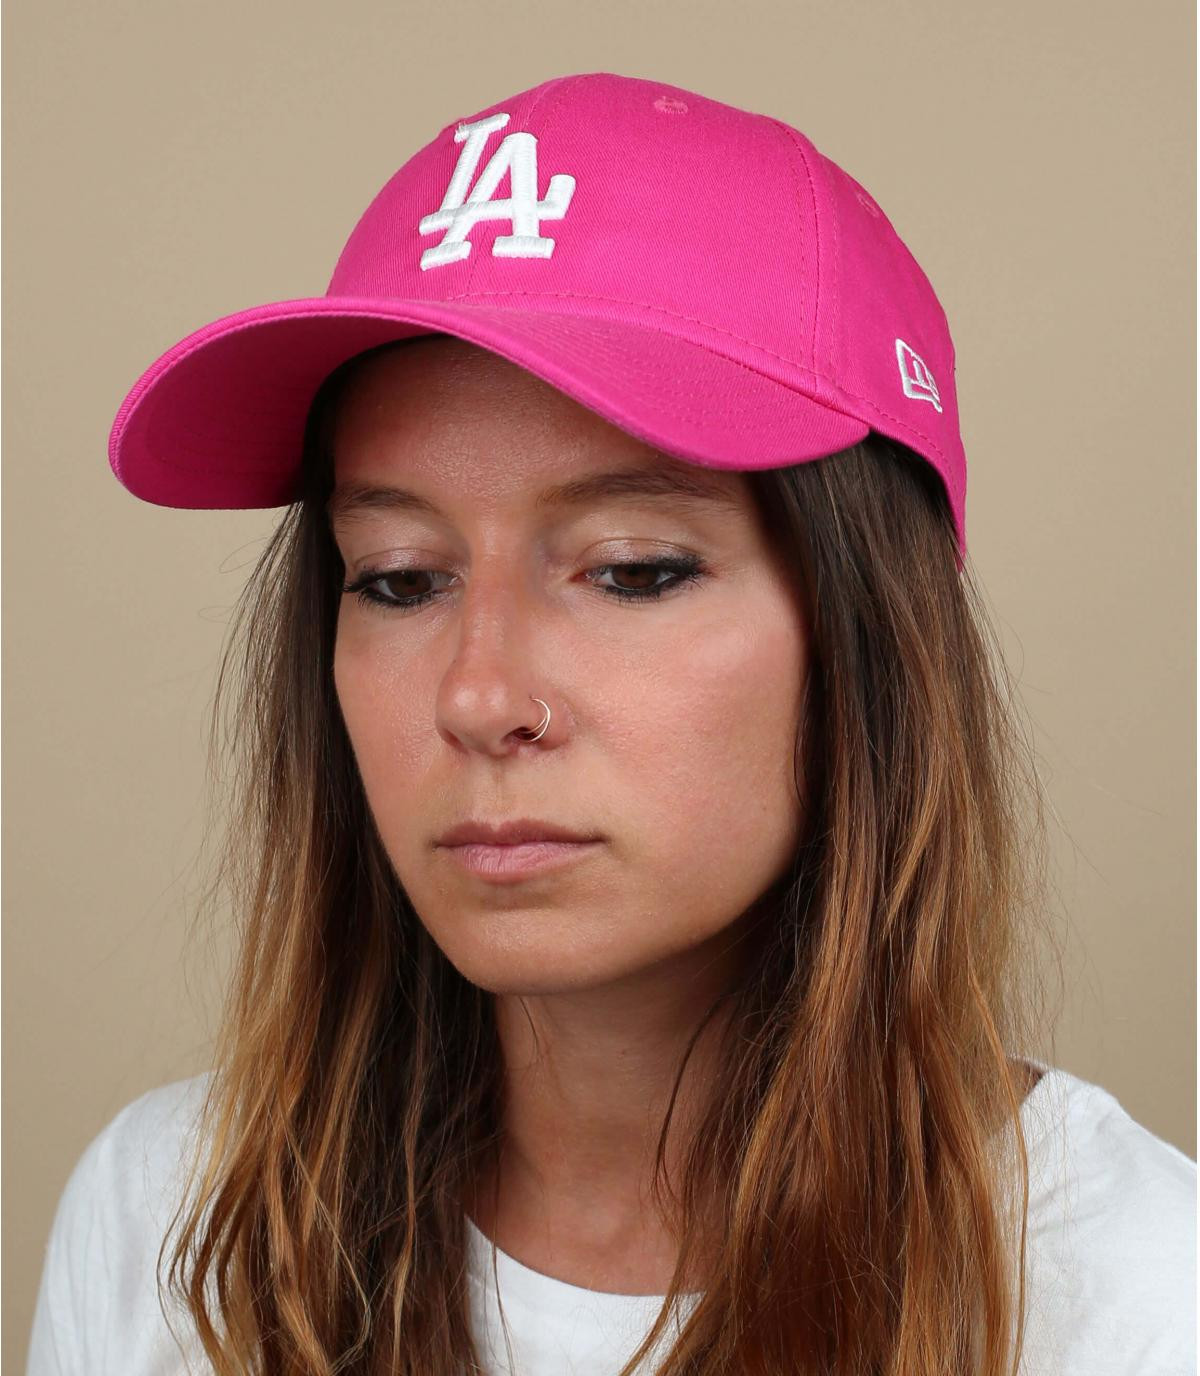 casquette LA femme rose